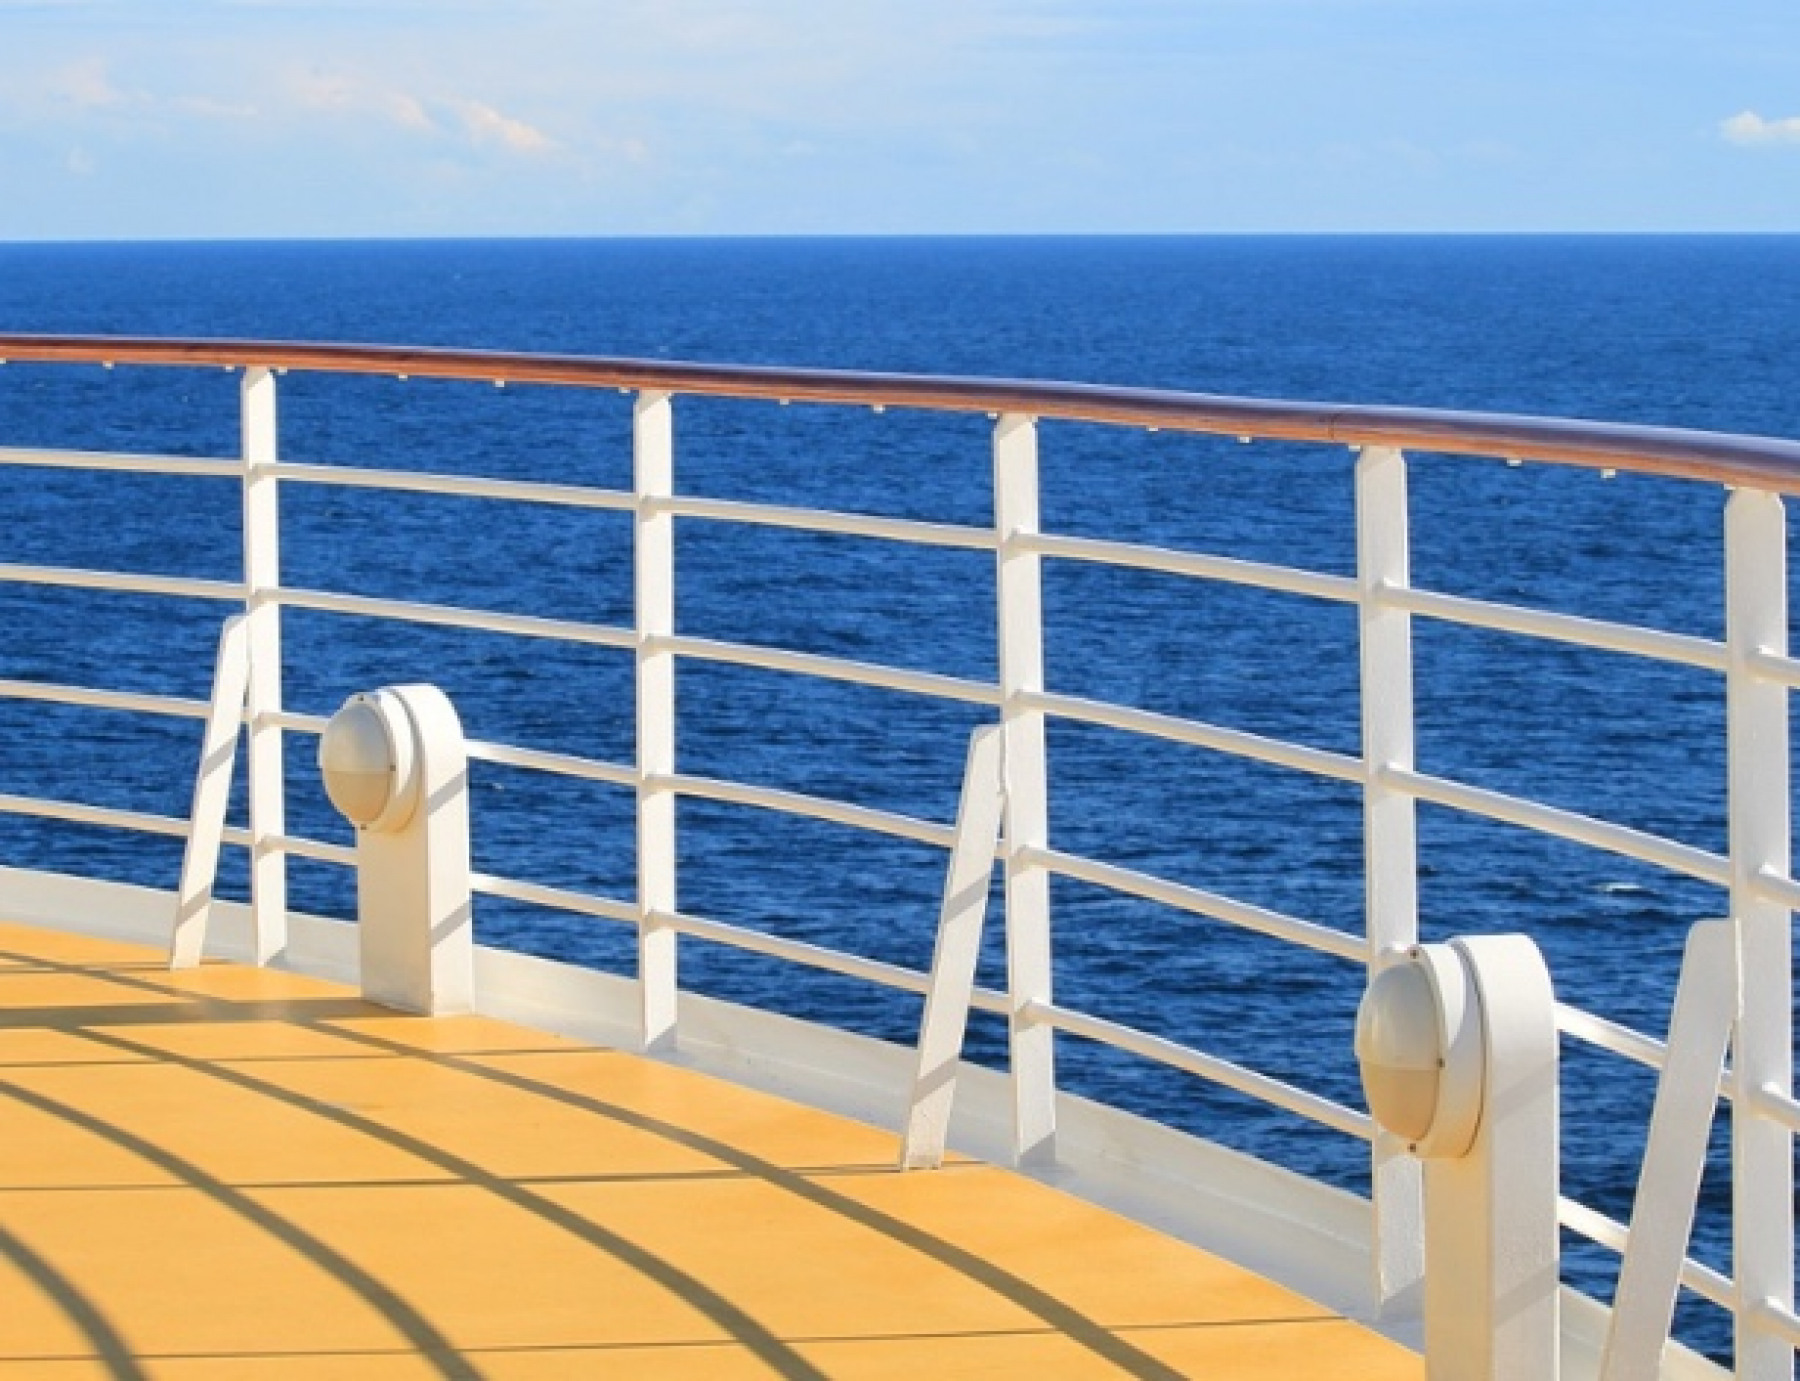 Carnival Cruise Lines Carnival Dream Interiordive-in-movies-1.jpg